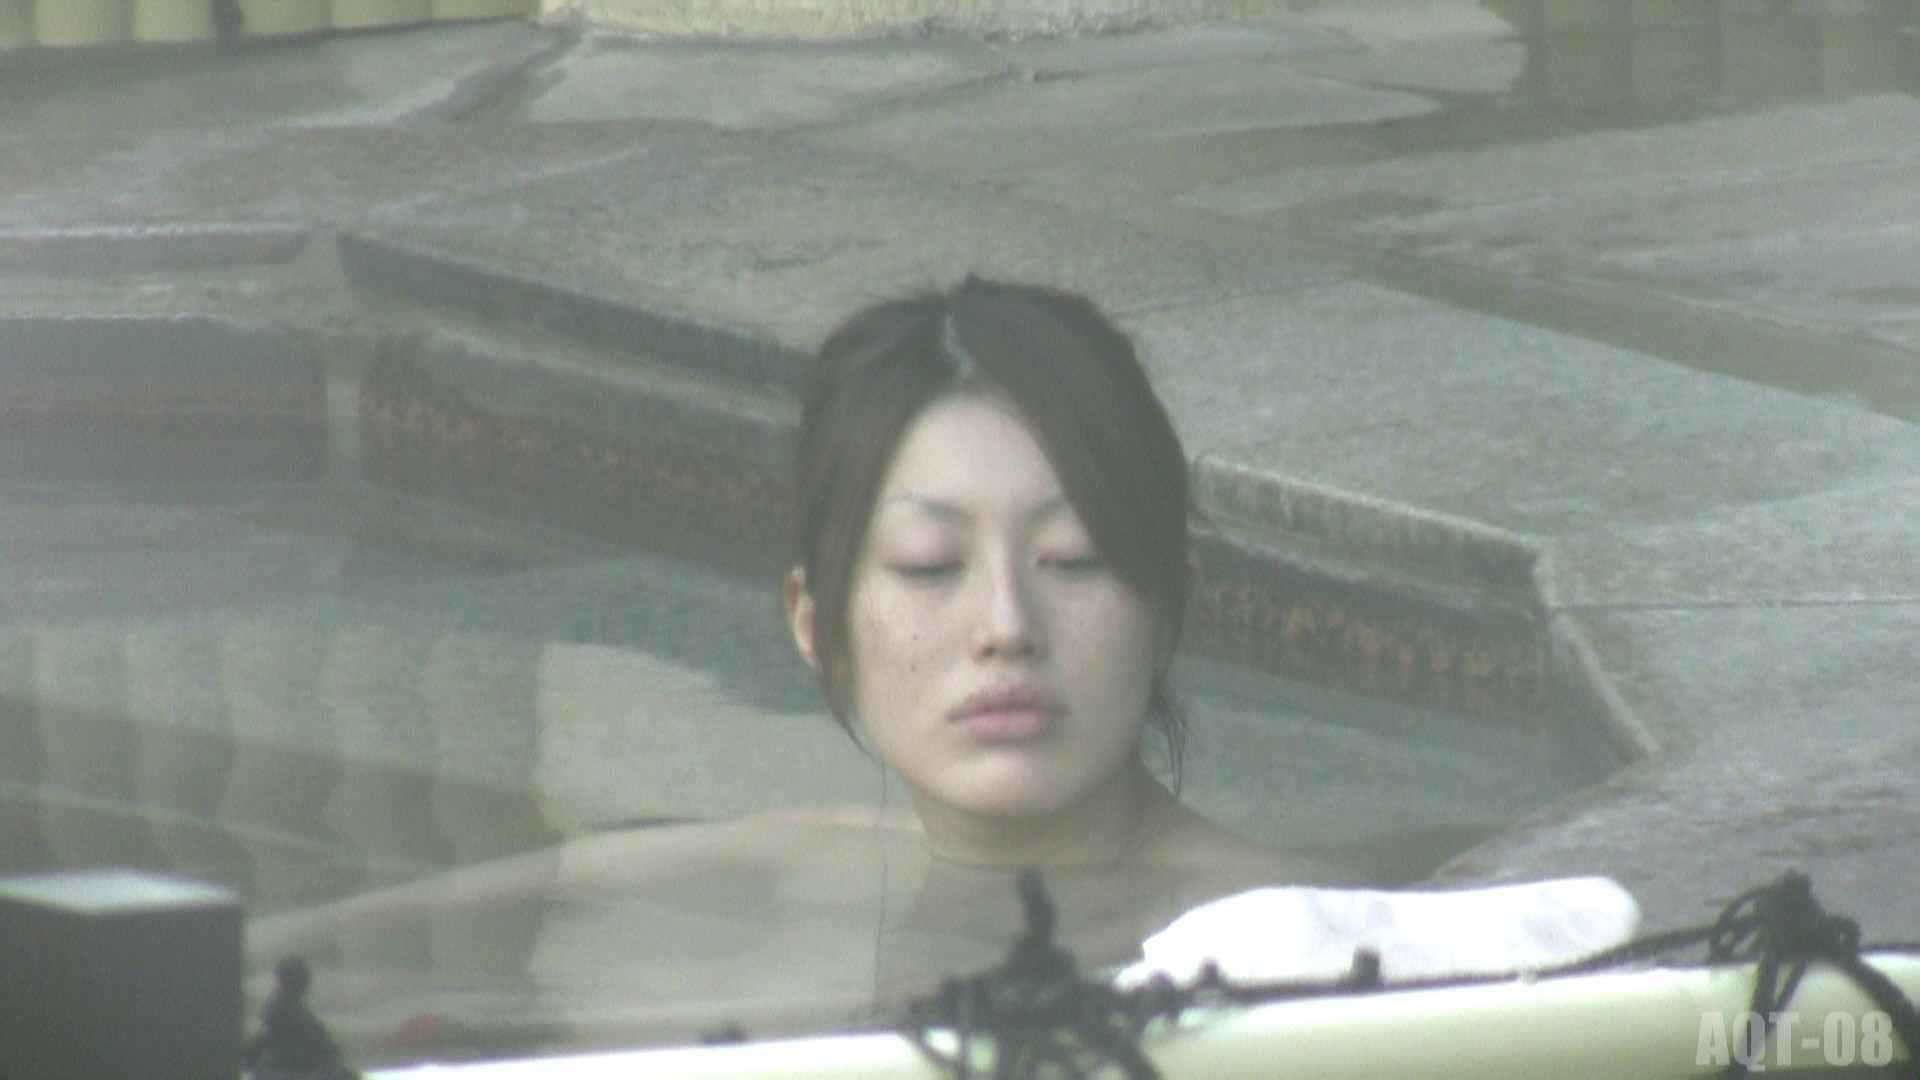 Aquaな露天風呂Vol.775 盗撮映像  74Pix 50